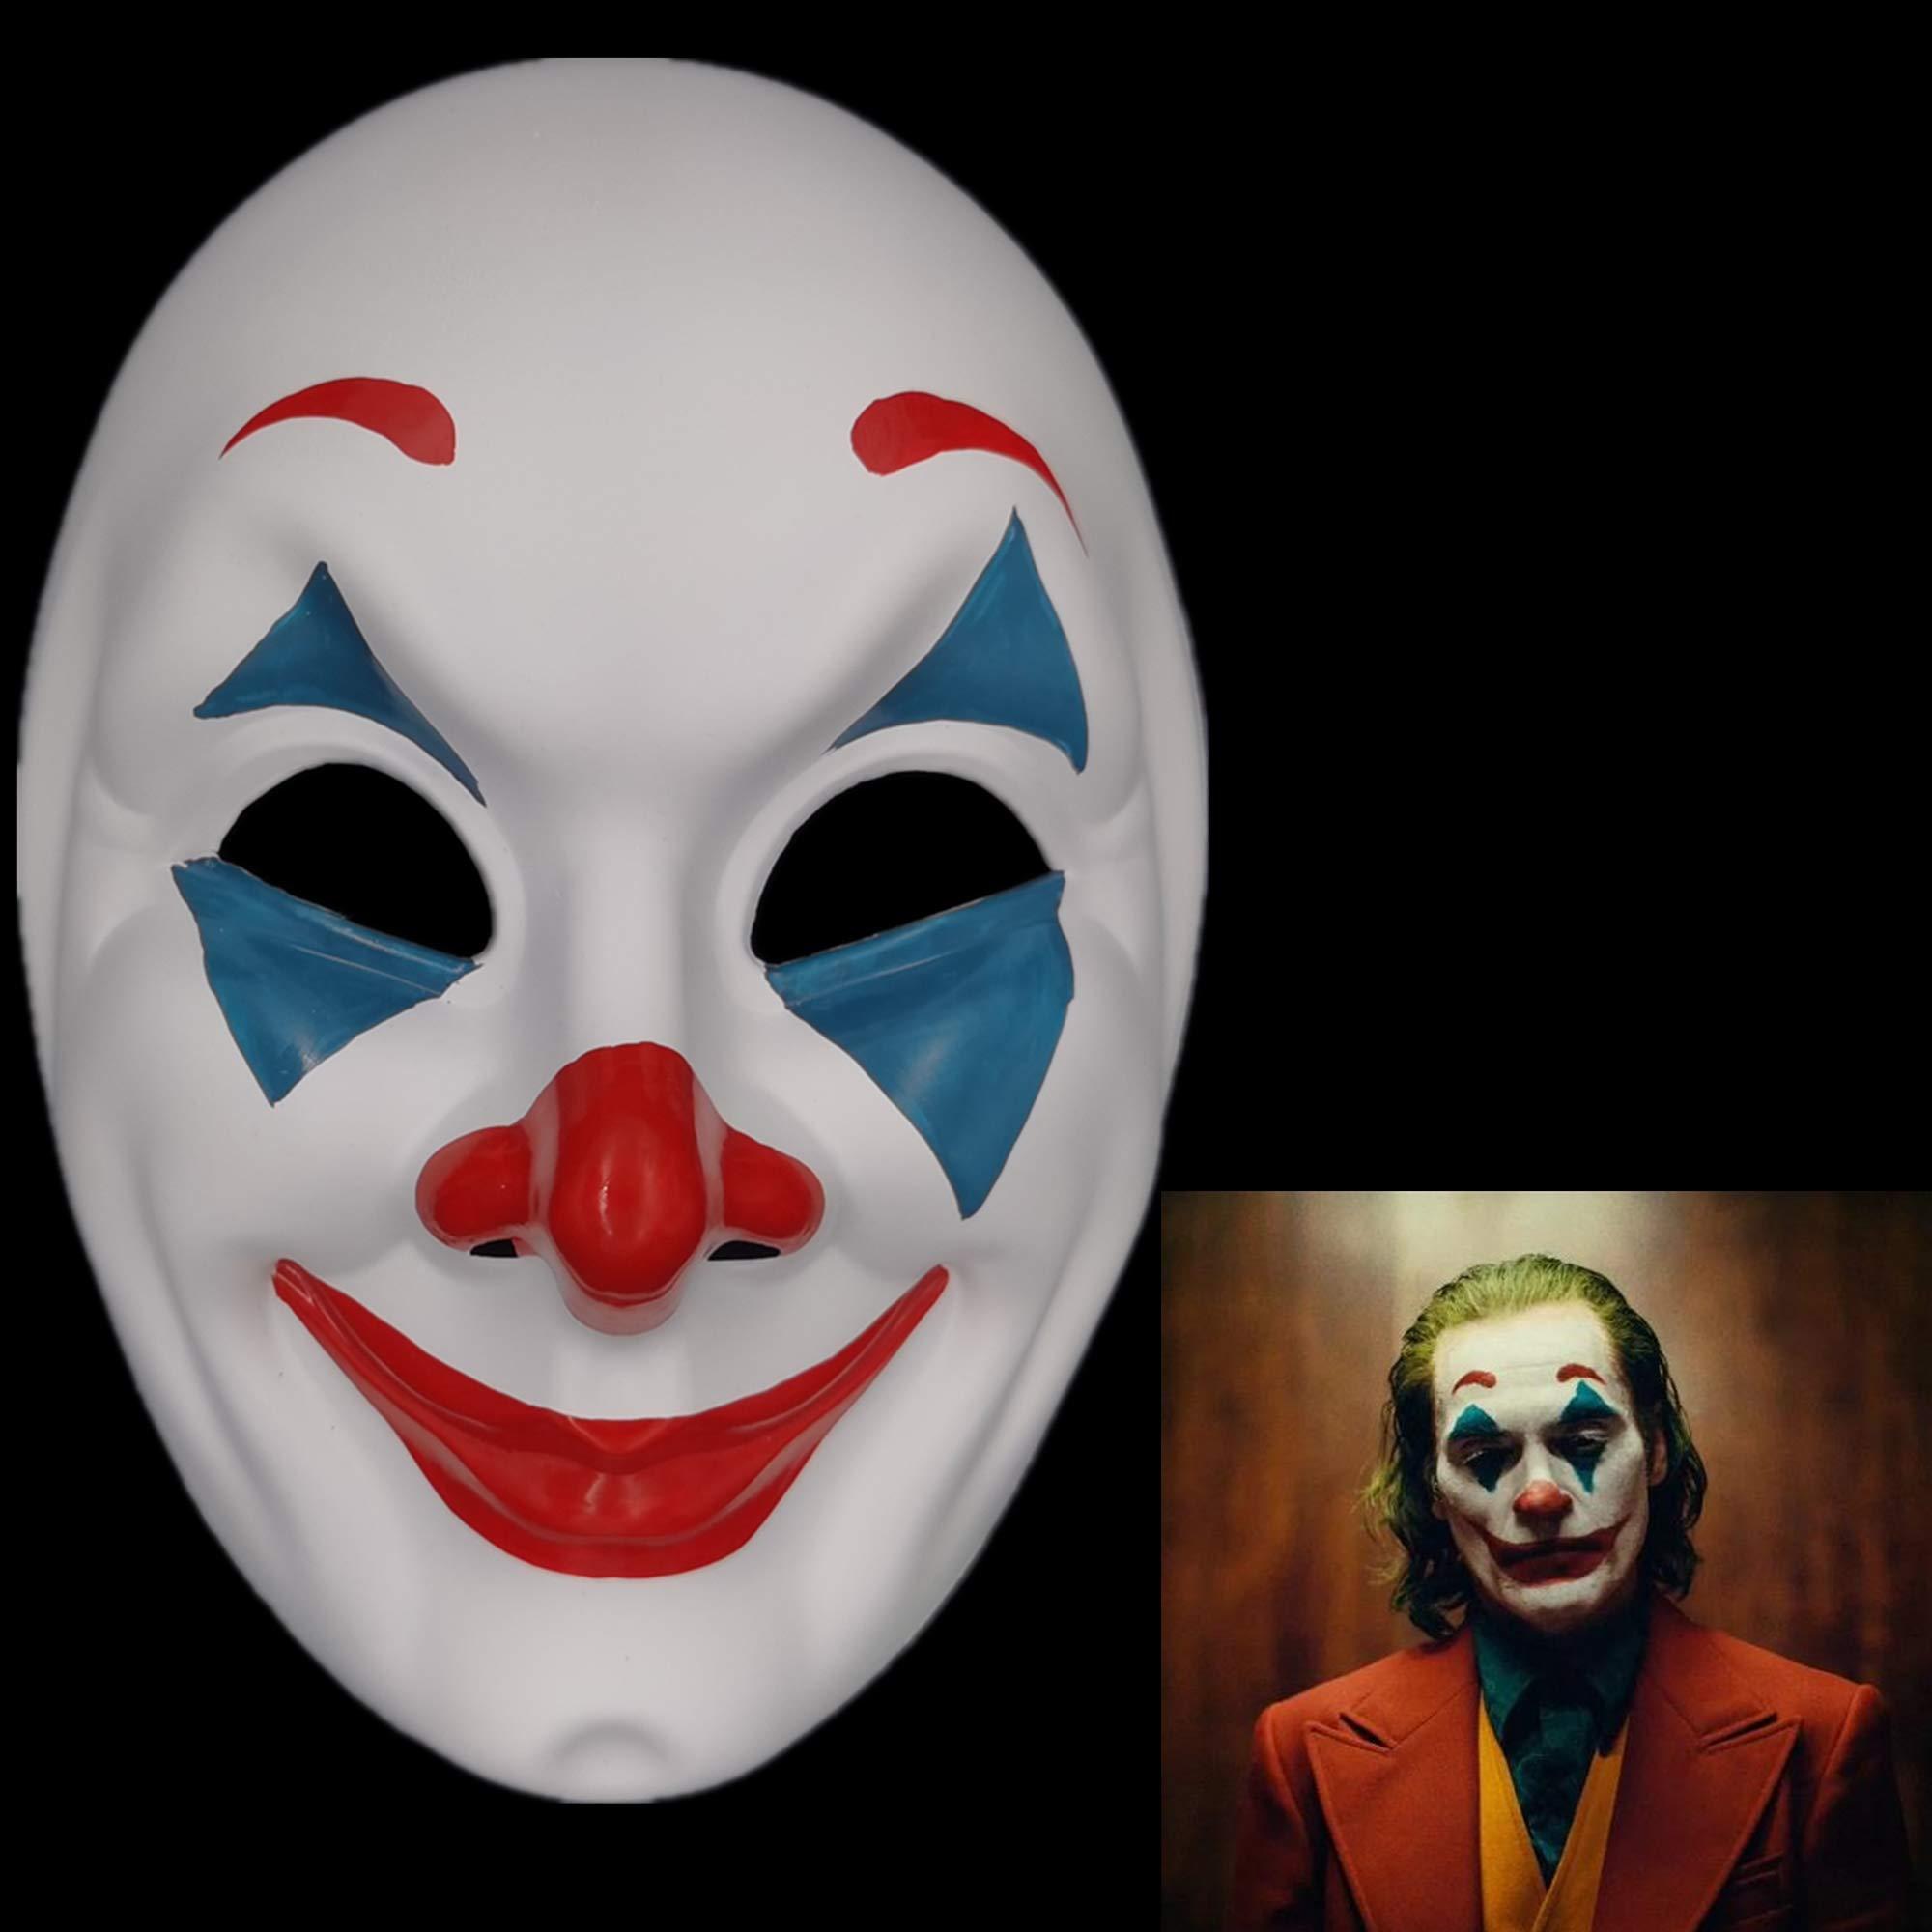 Ubauta Joker Mask Cosplay Movie Horror Scary Smile Evil Clown Halloween Mask-Hand Painted (1 Pack): Amazon.es: Juguetes y juegos